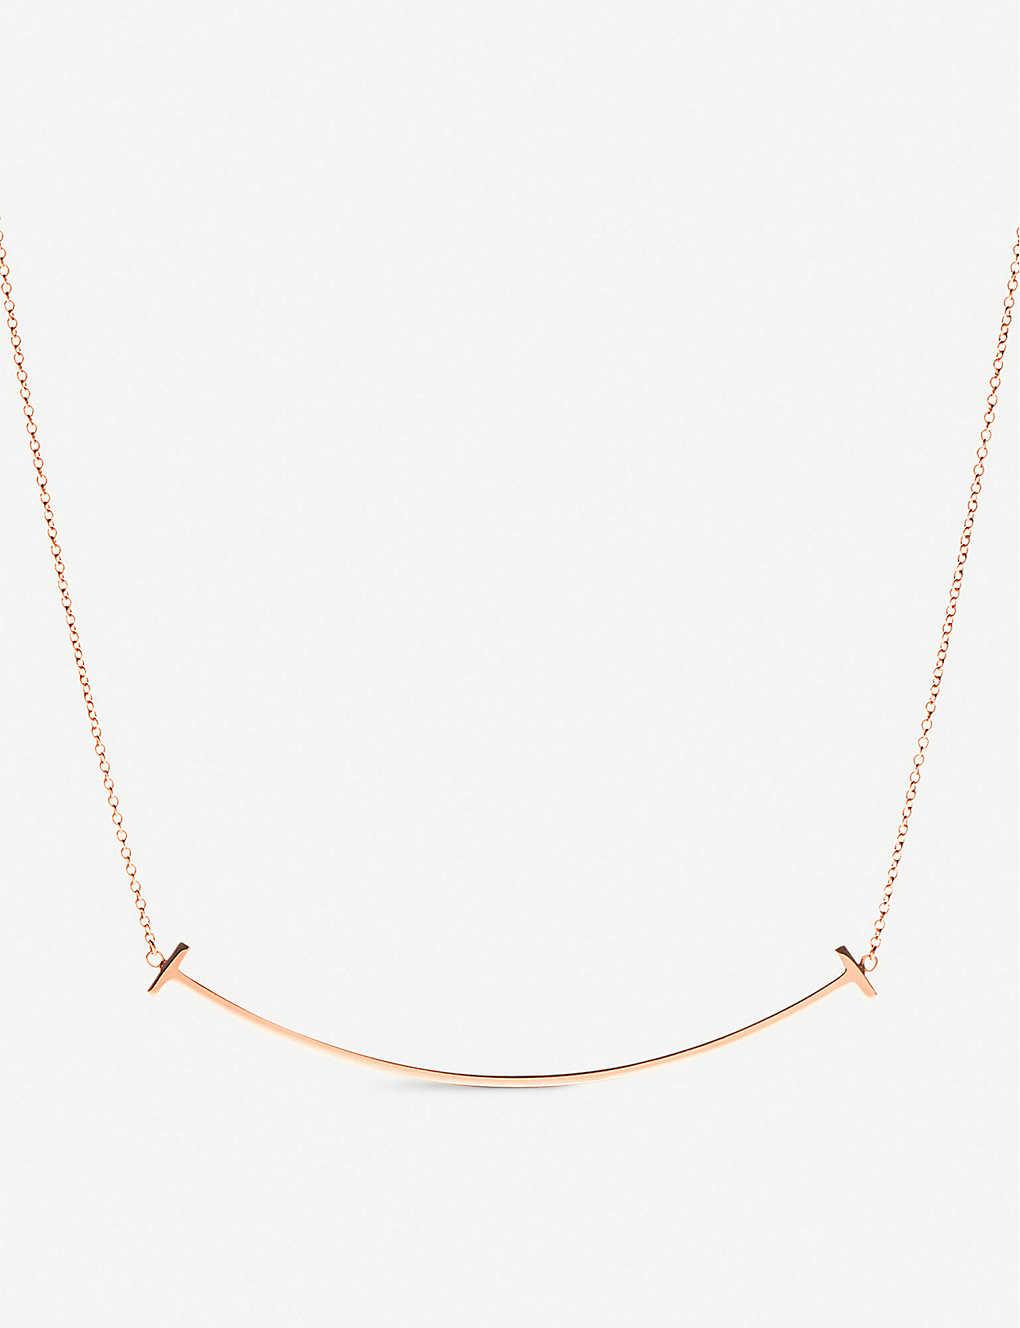 ad3a201ab TIFFANY & CO - Tiffany T smile pendant in 18k rose gold | Selfridges.com